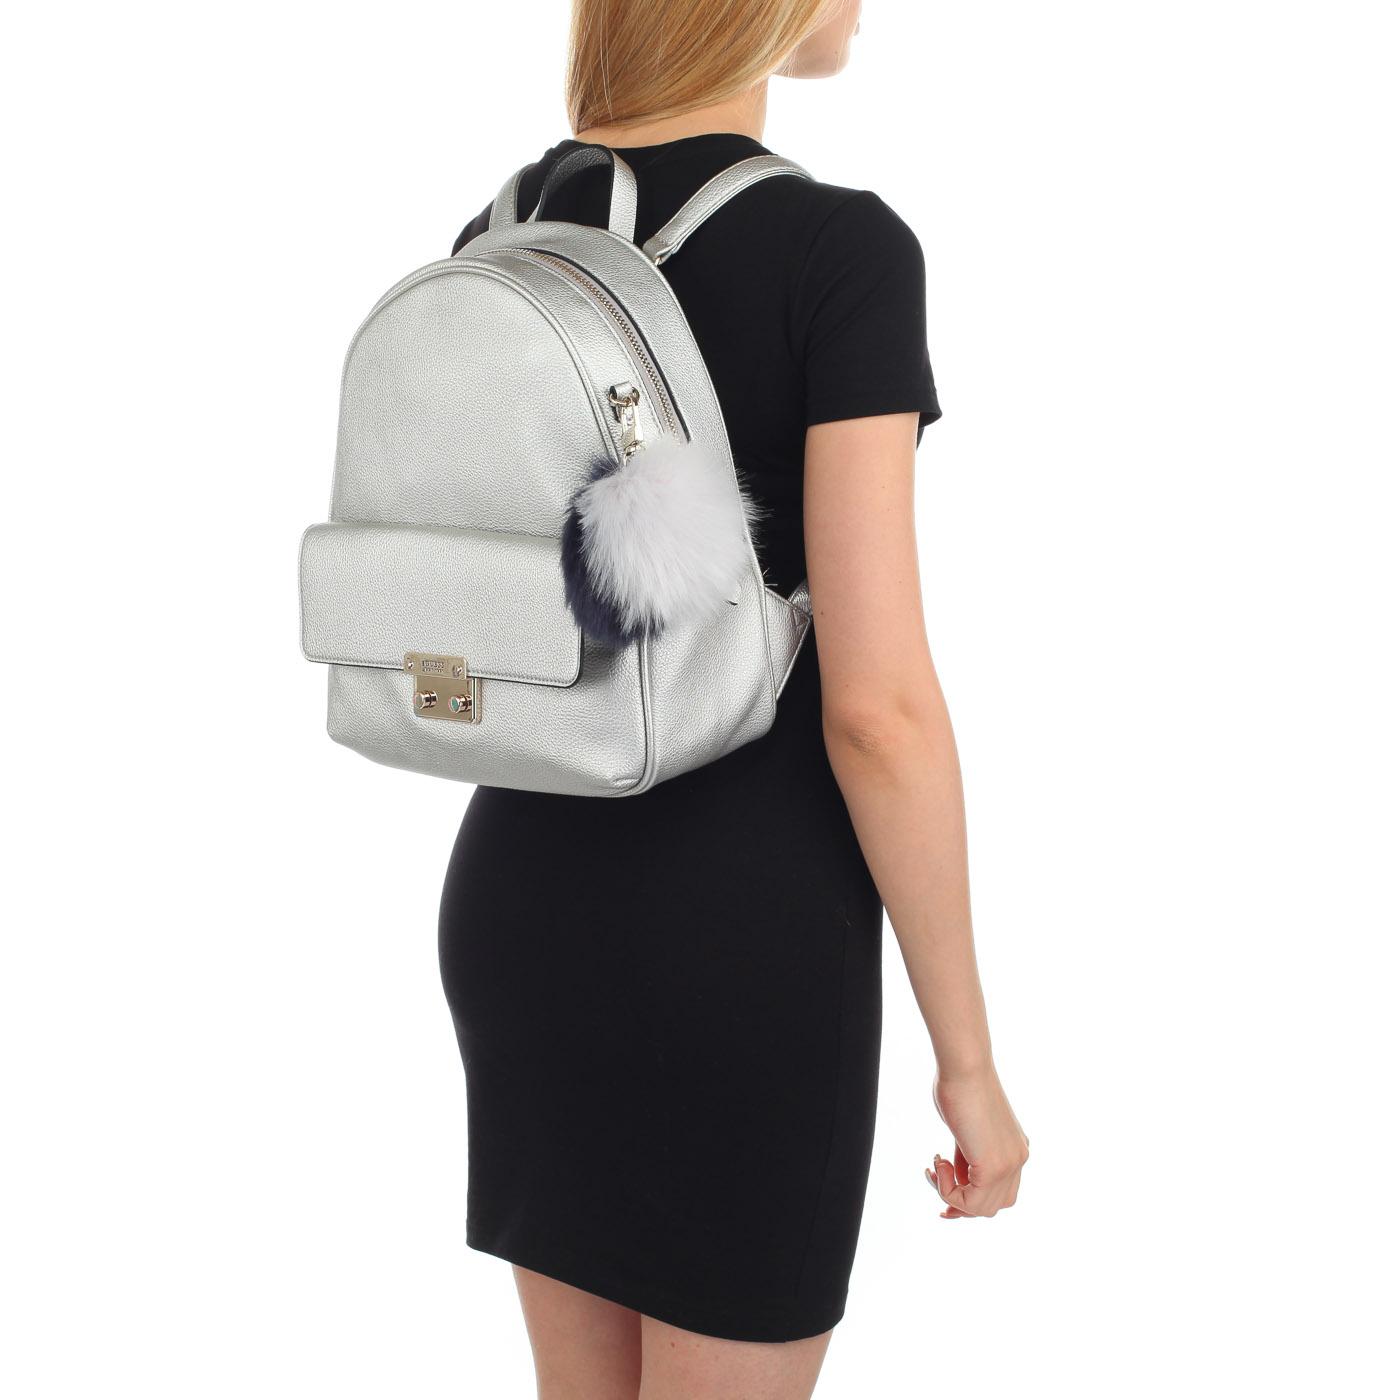 1476a37b30ef Женский рюкзак с брелоком Guess Varsity Pop HWMG69 67320_silver ...